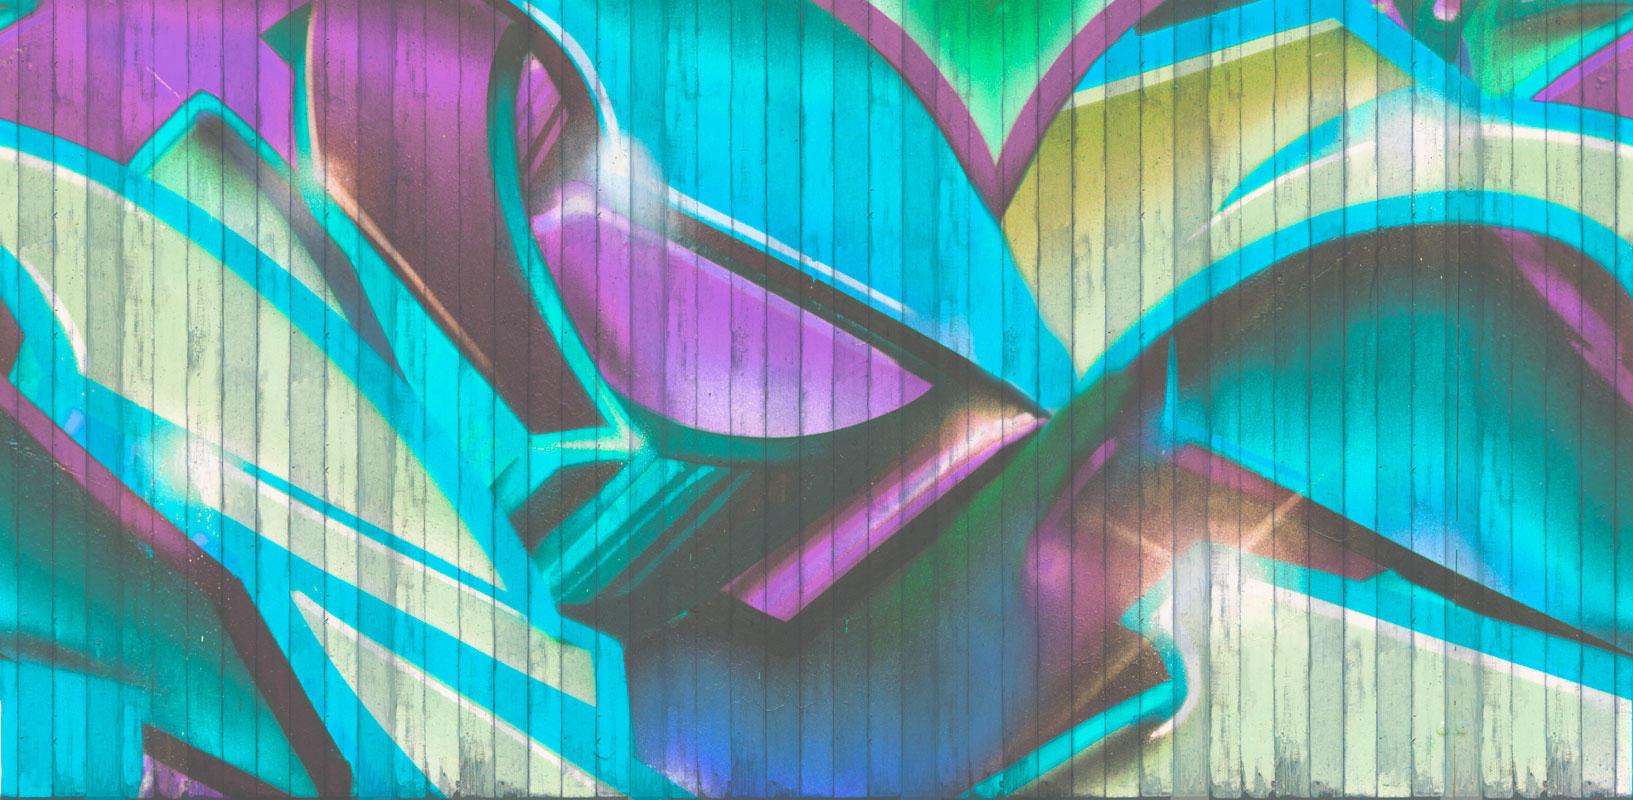 Фотообои (панно) Mr. Perswall Street Art P200101-0, интернет магазин Волео